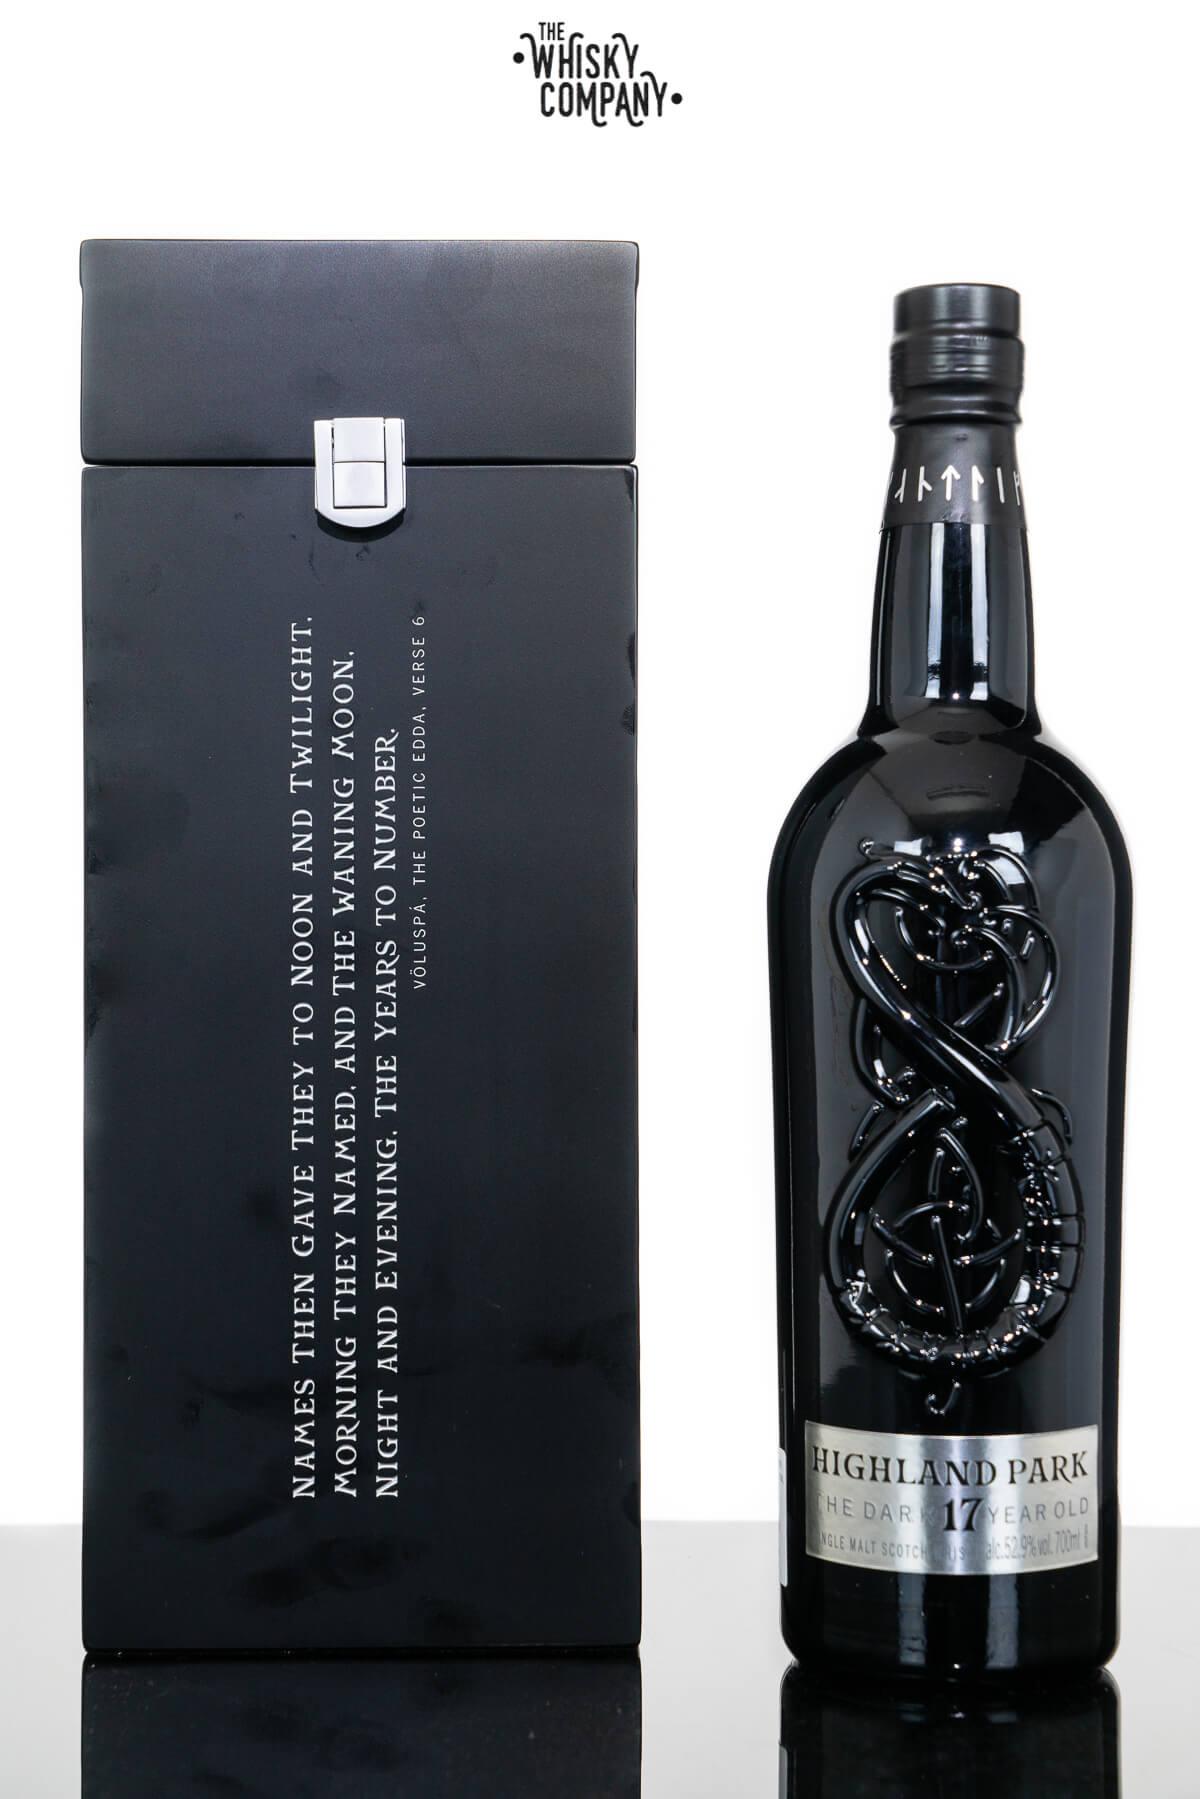 Highland Park 17 Years Old The Dark Single Malt Scotch Whisky (700ml)